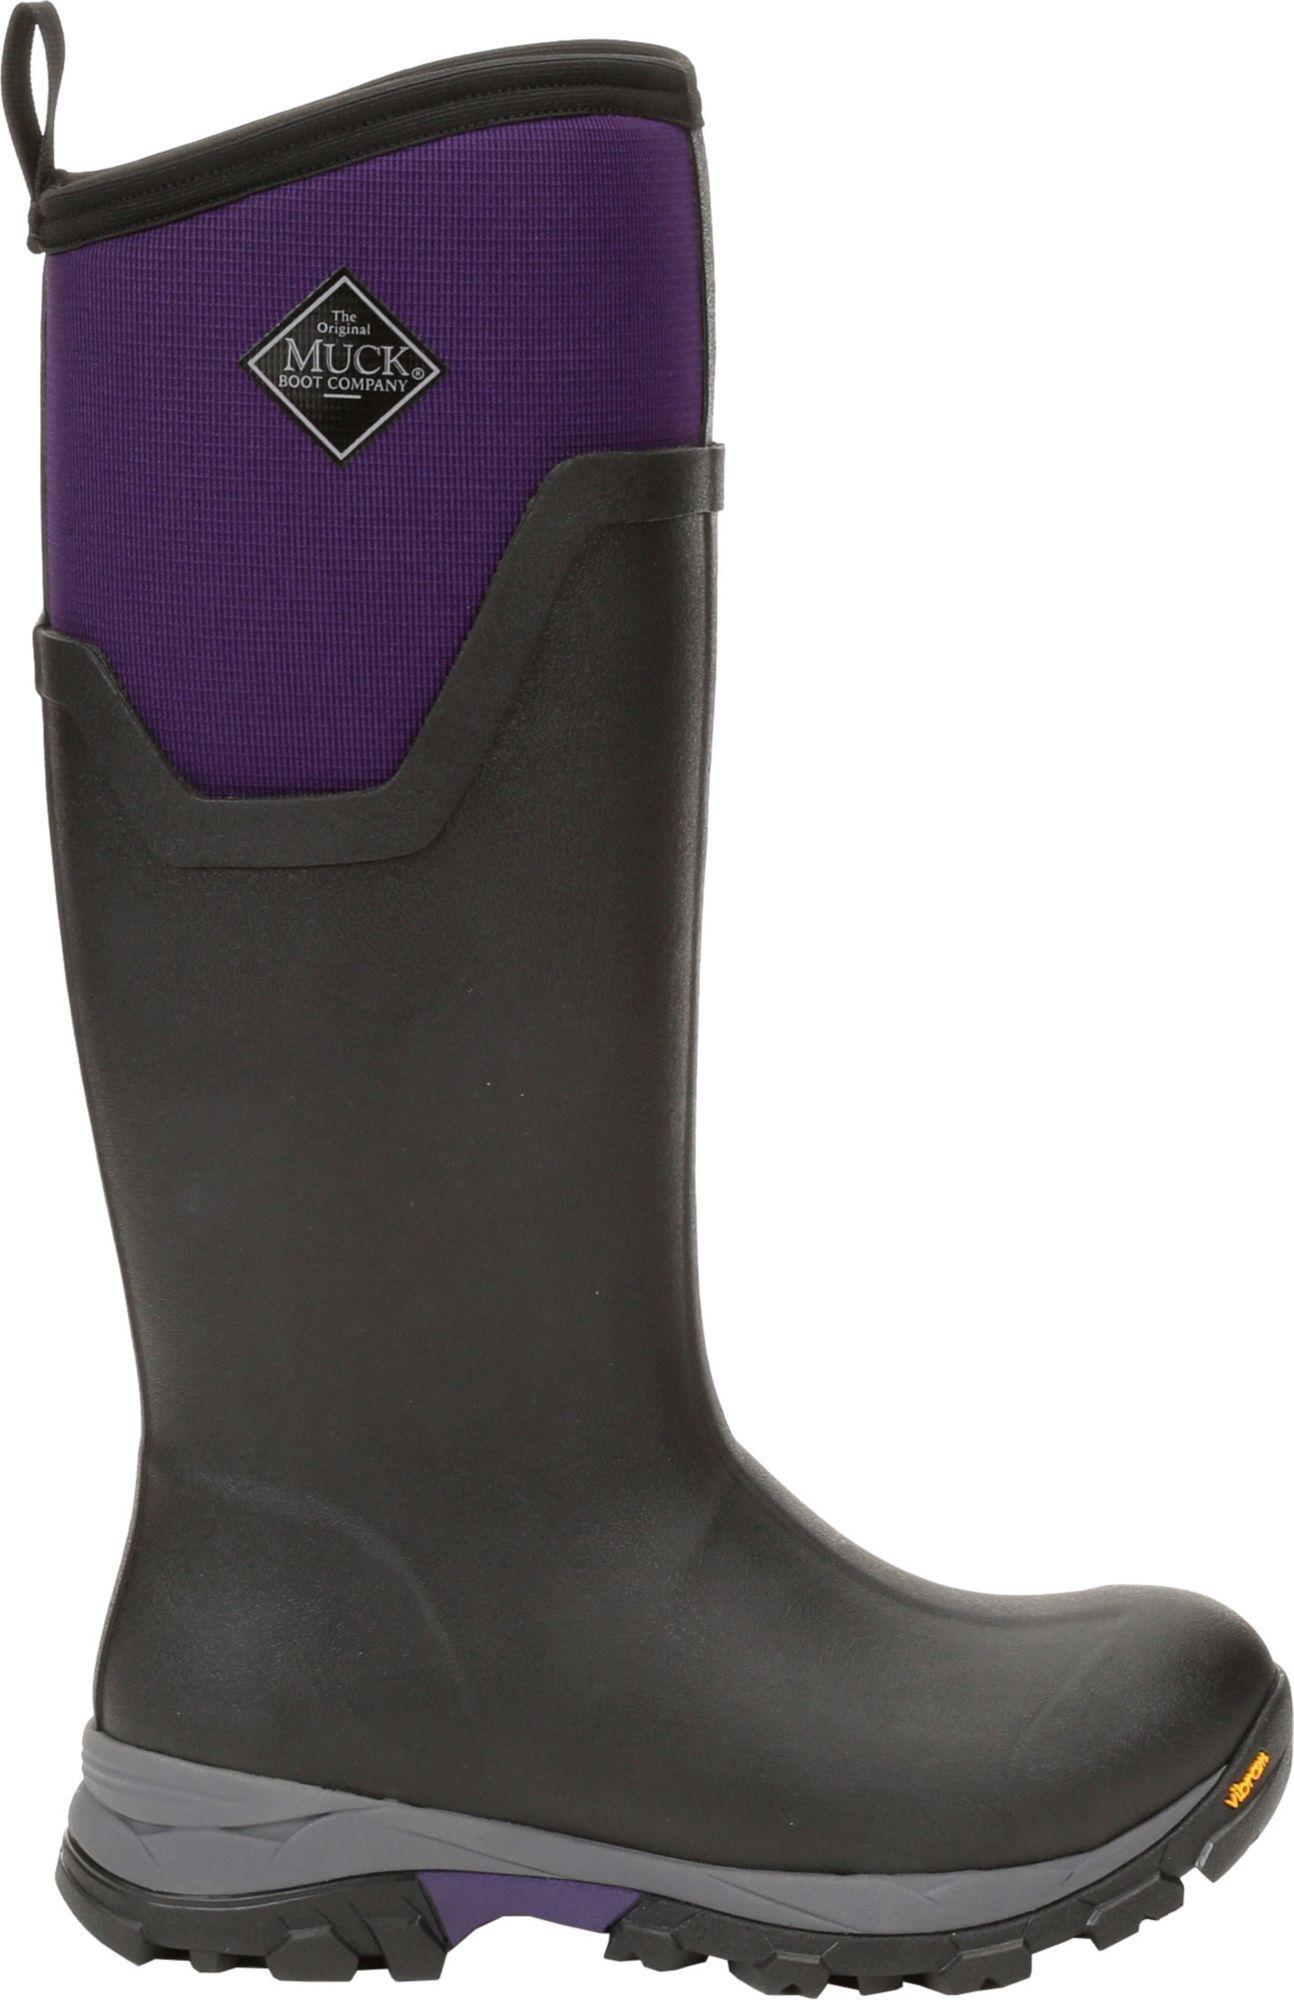 Muck Boots Women's Arctic Ice II Tall Waterproof Winter Boots